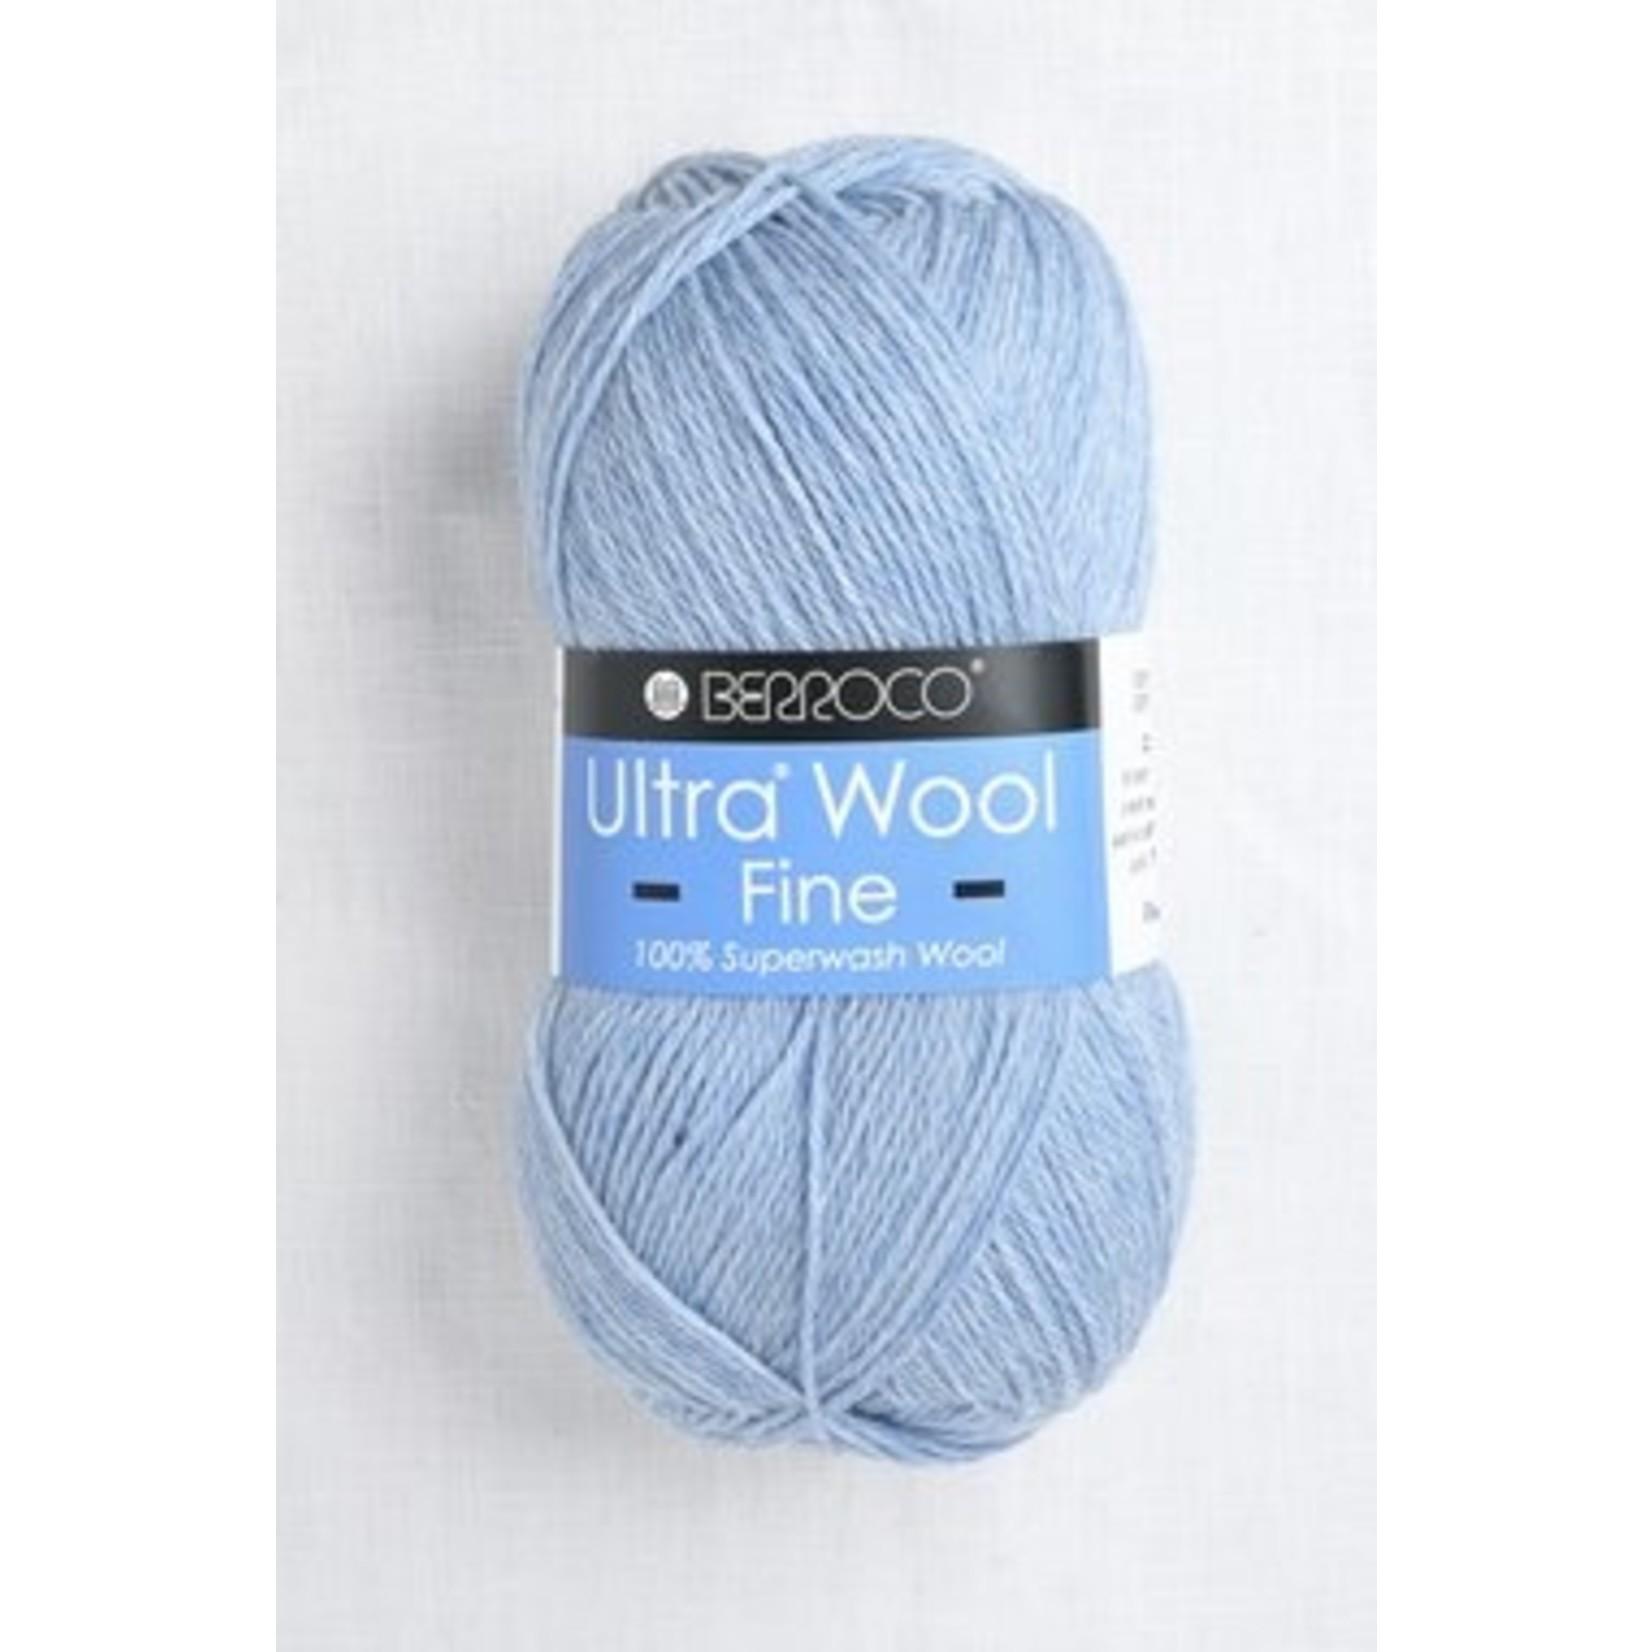 Berroco Berroco Ultra Wool Fine, 53162, Forget-Me-Not